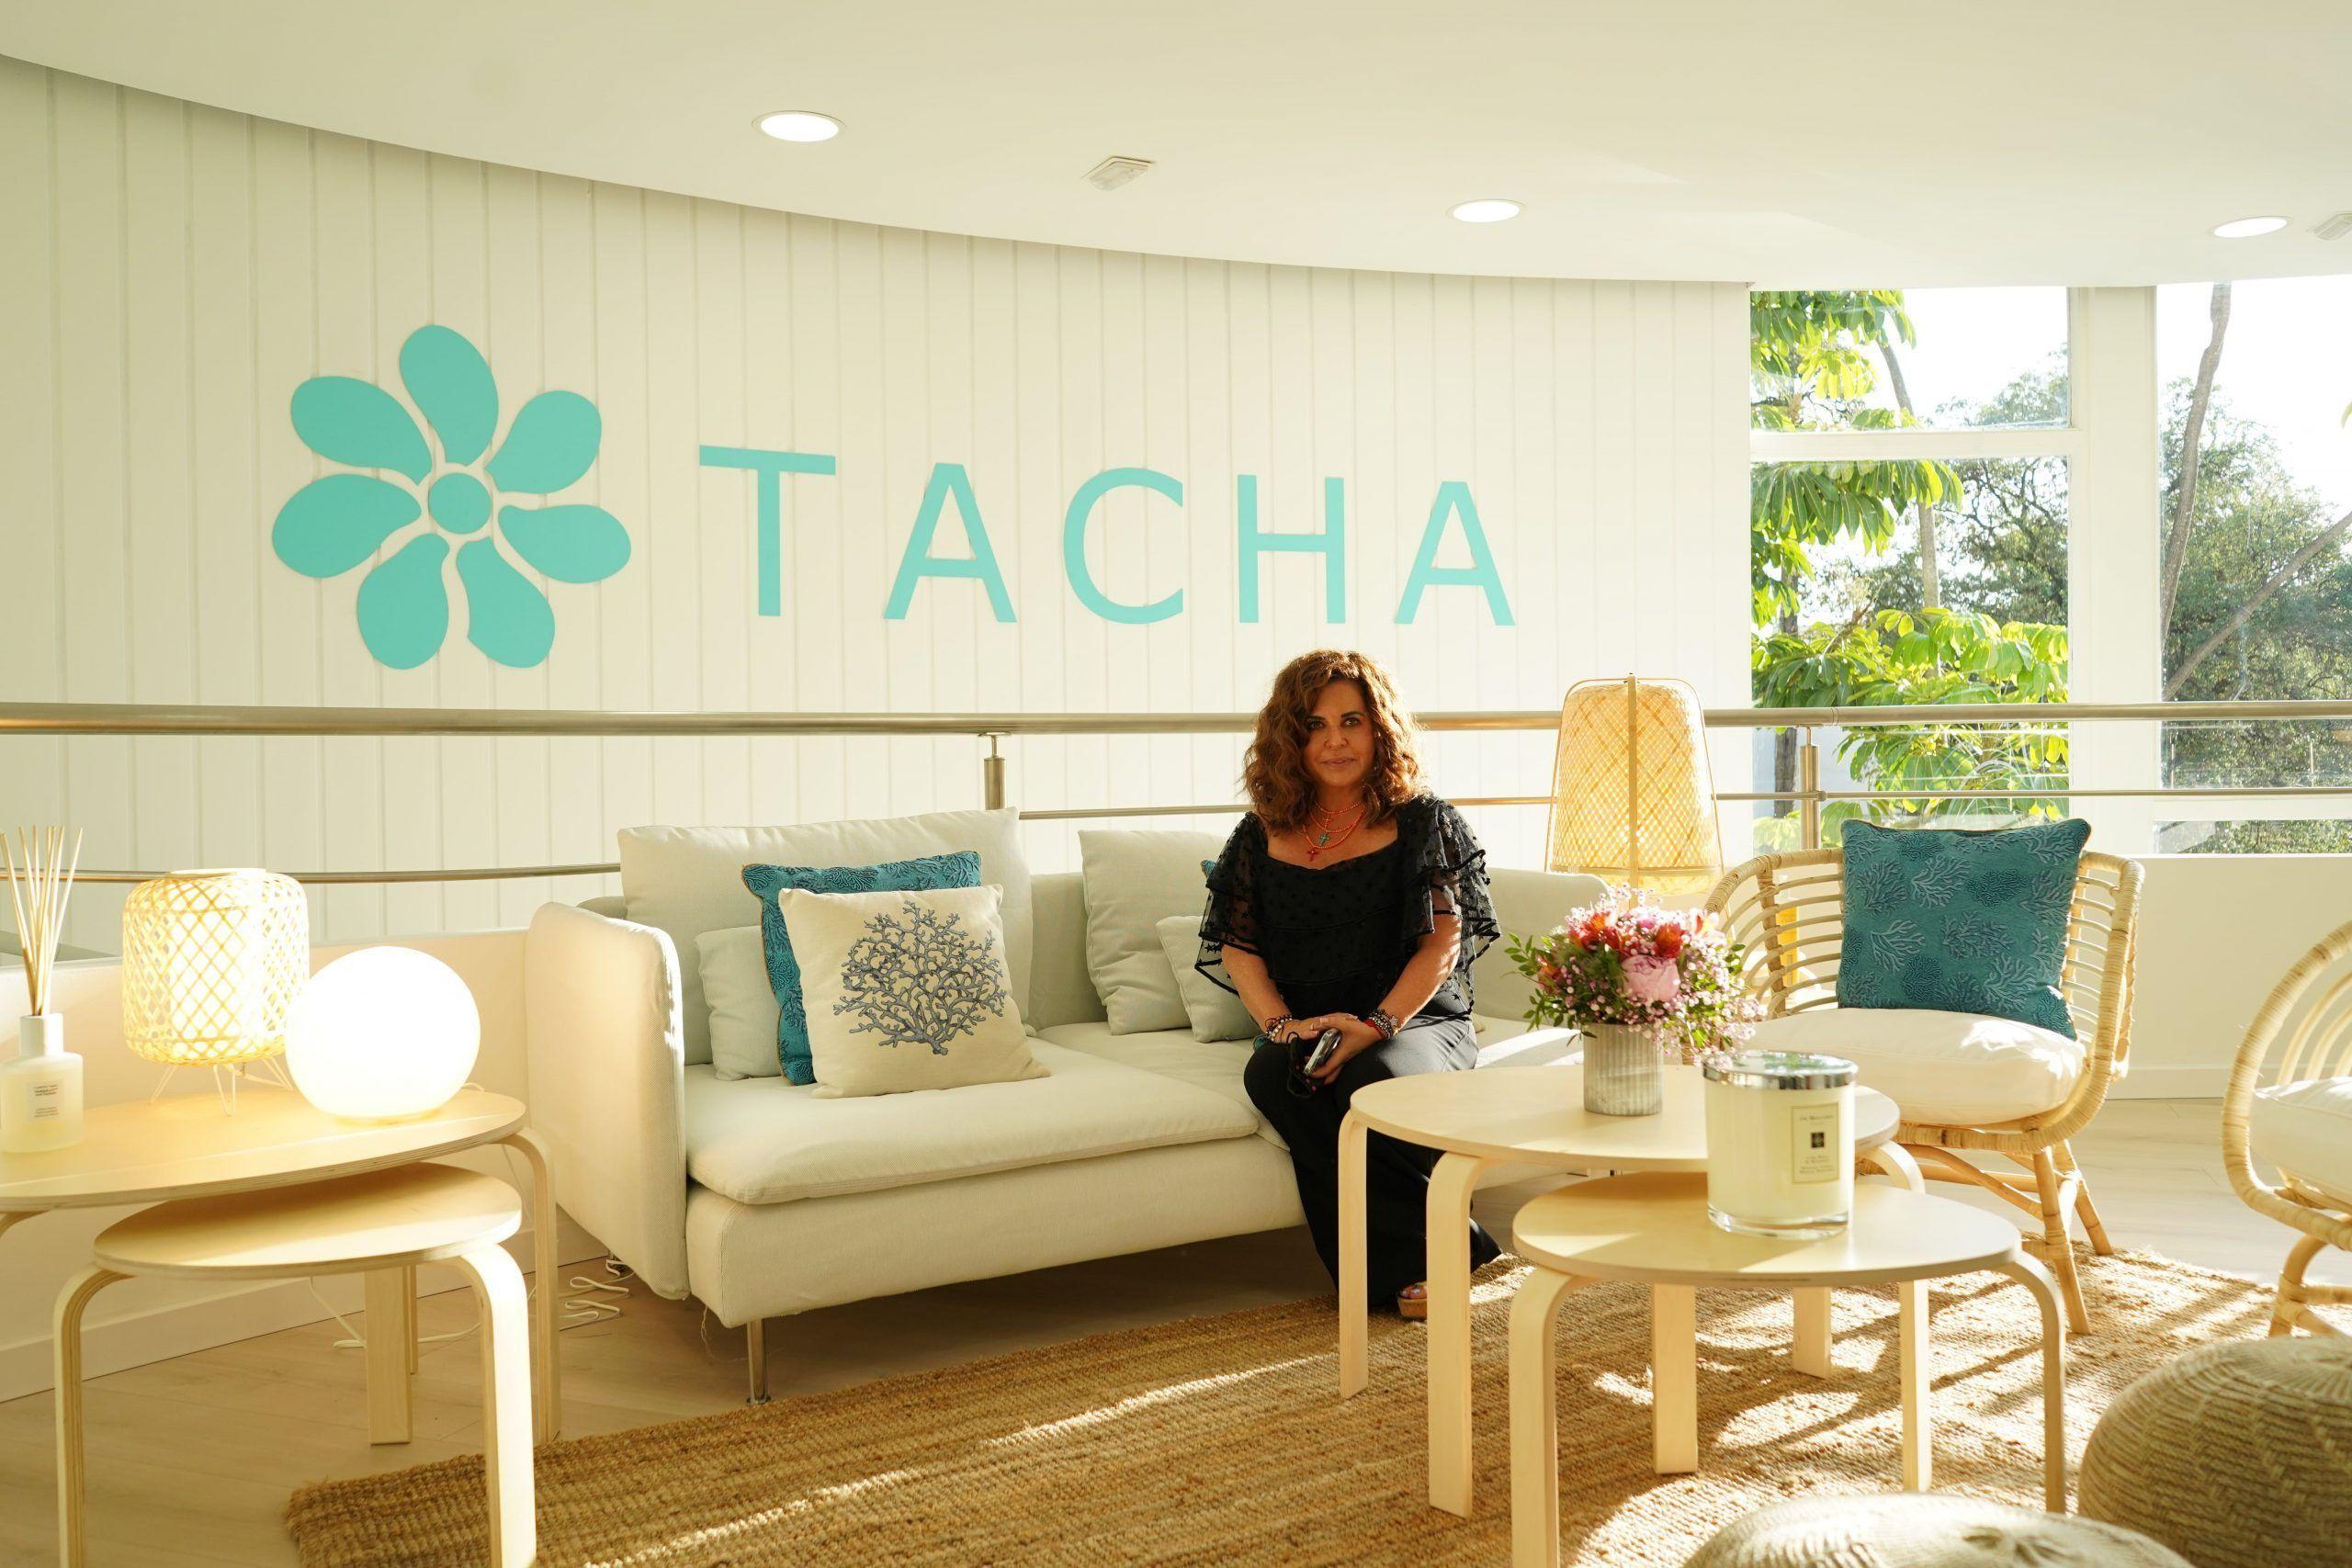 Tacha-Marbella